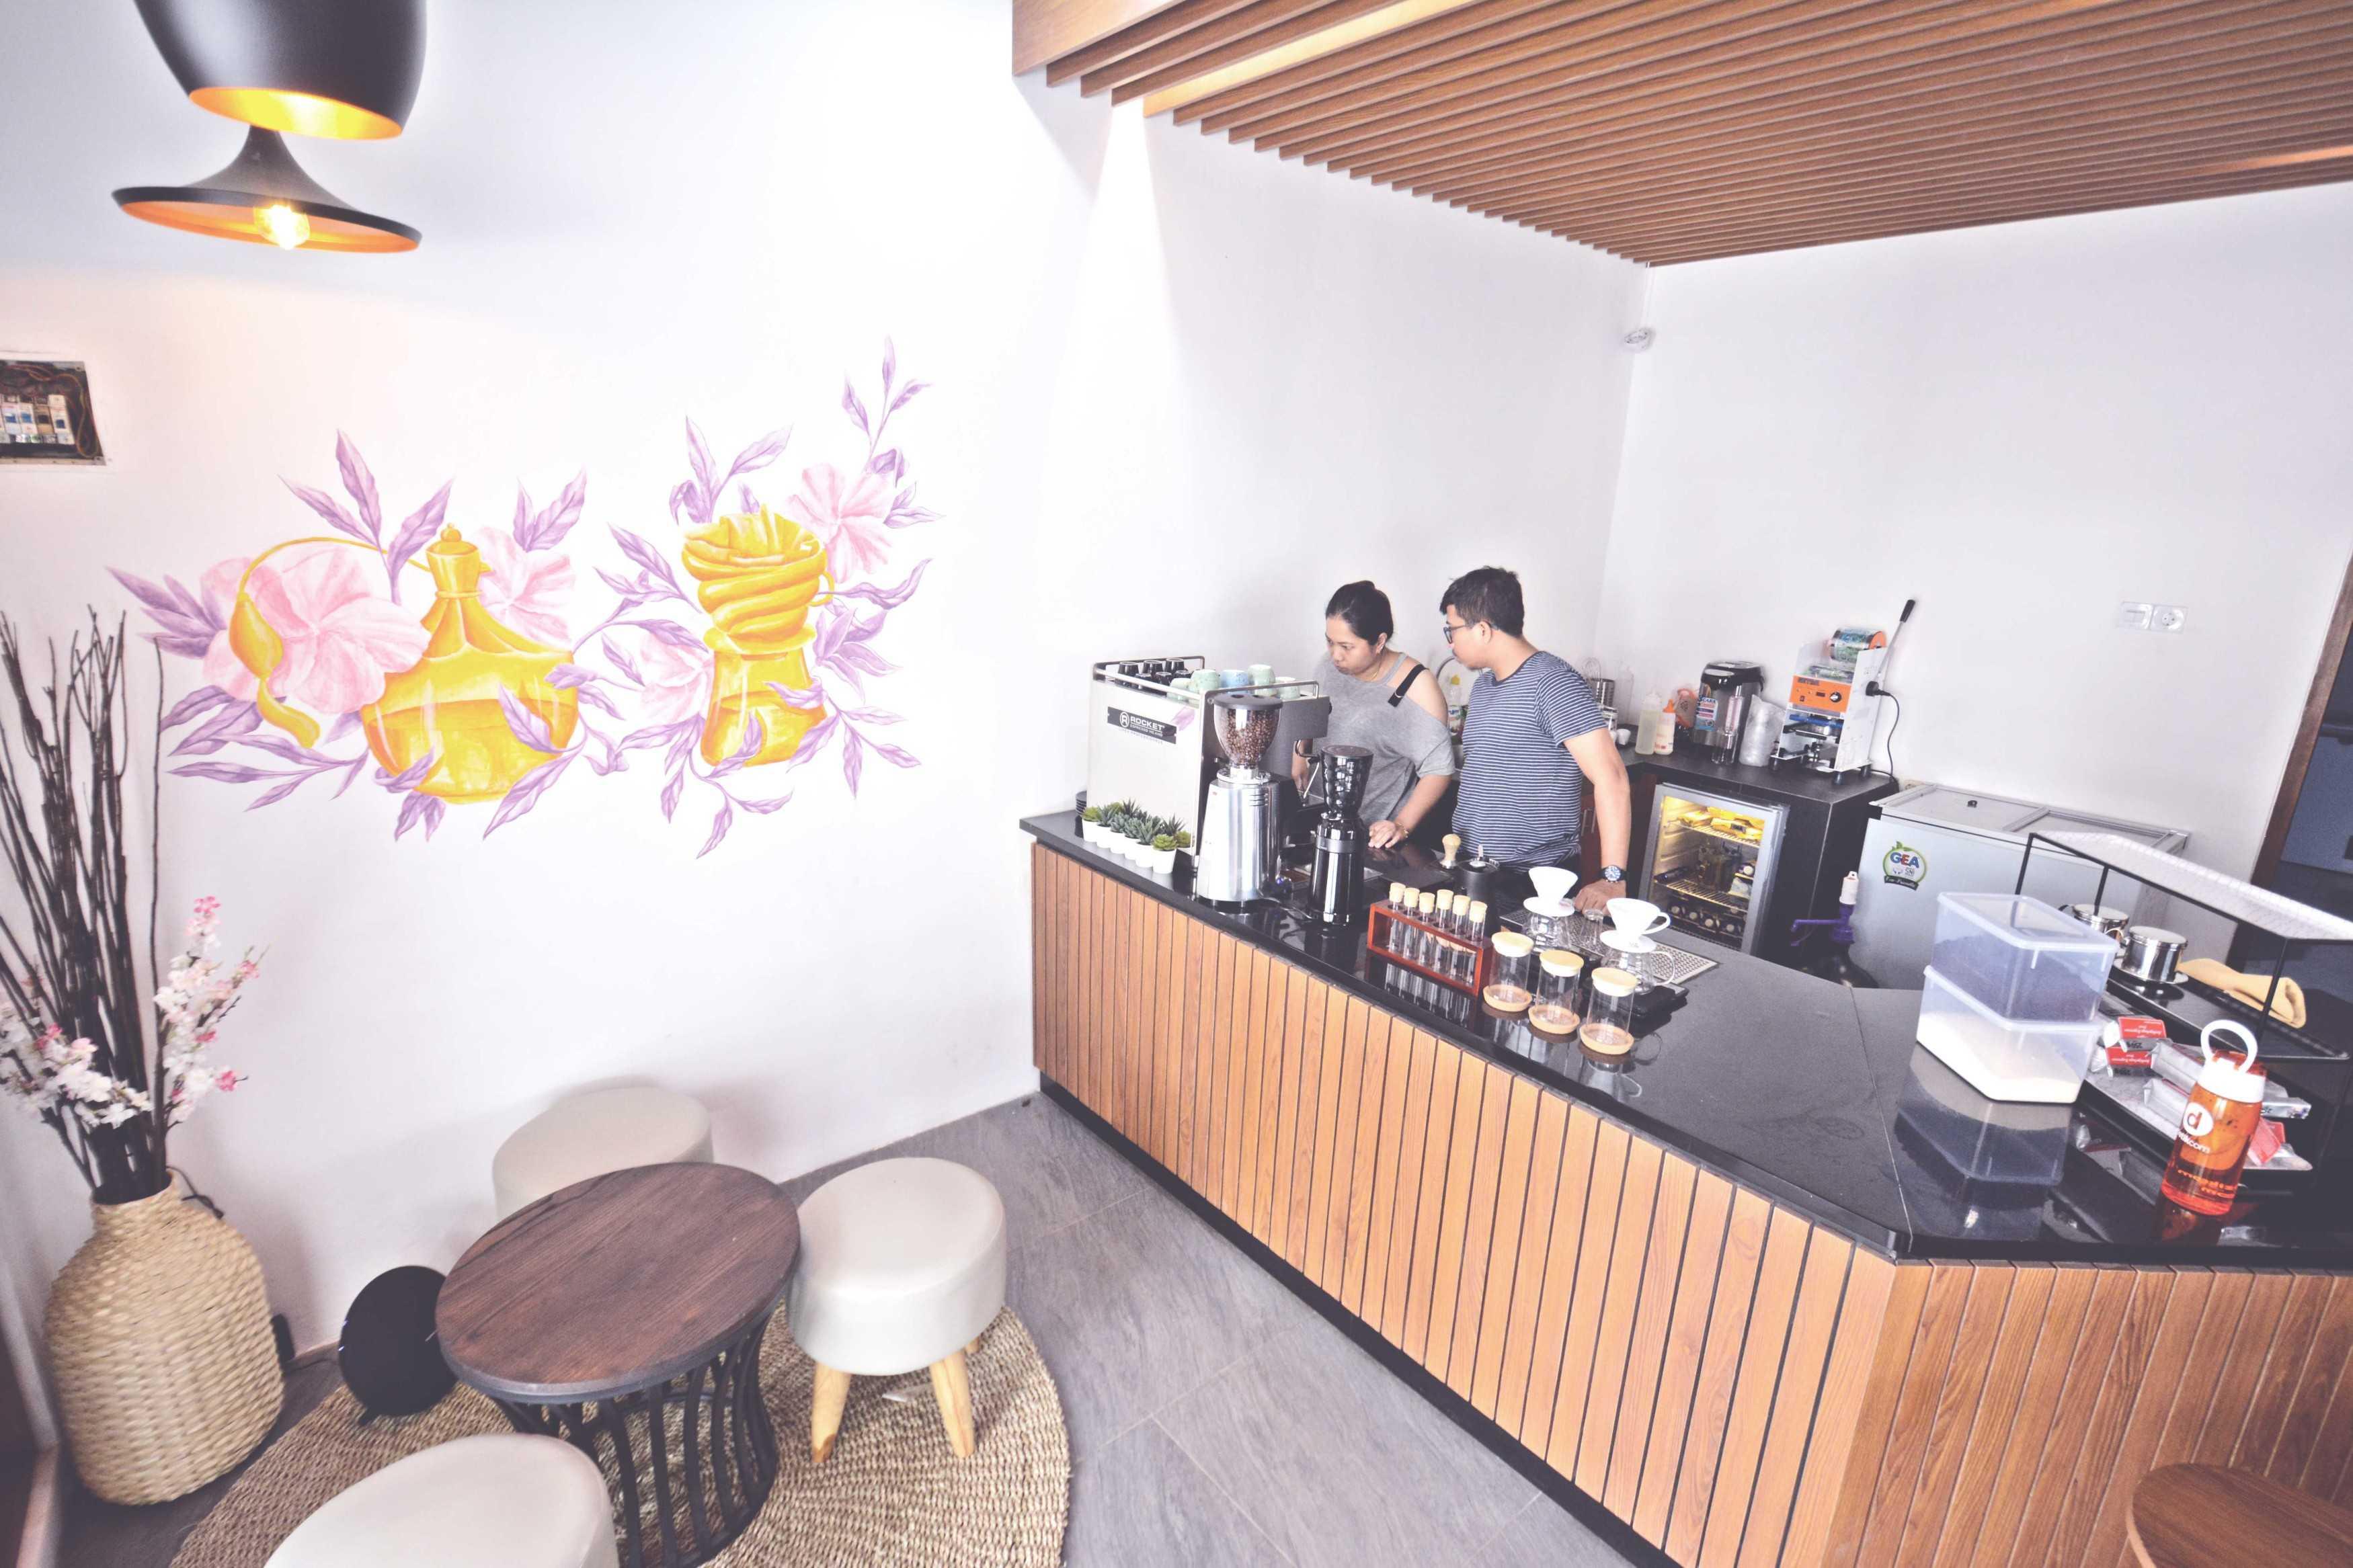 Mki Ts Cafe Jakarta Timur, Kota Jakarta Timur, Daerah Khusus Ibukota Jakarta, Indonesia Jakarta Timur, Kota Jakarta Timur, Daerah Khusus Ibukota Jakarta, Indonesia Mki-Ts-Cafe   92233